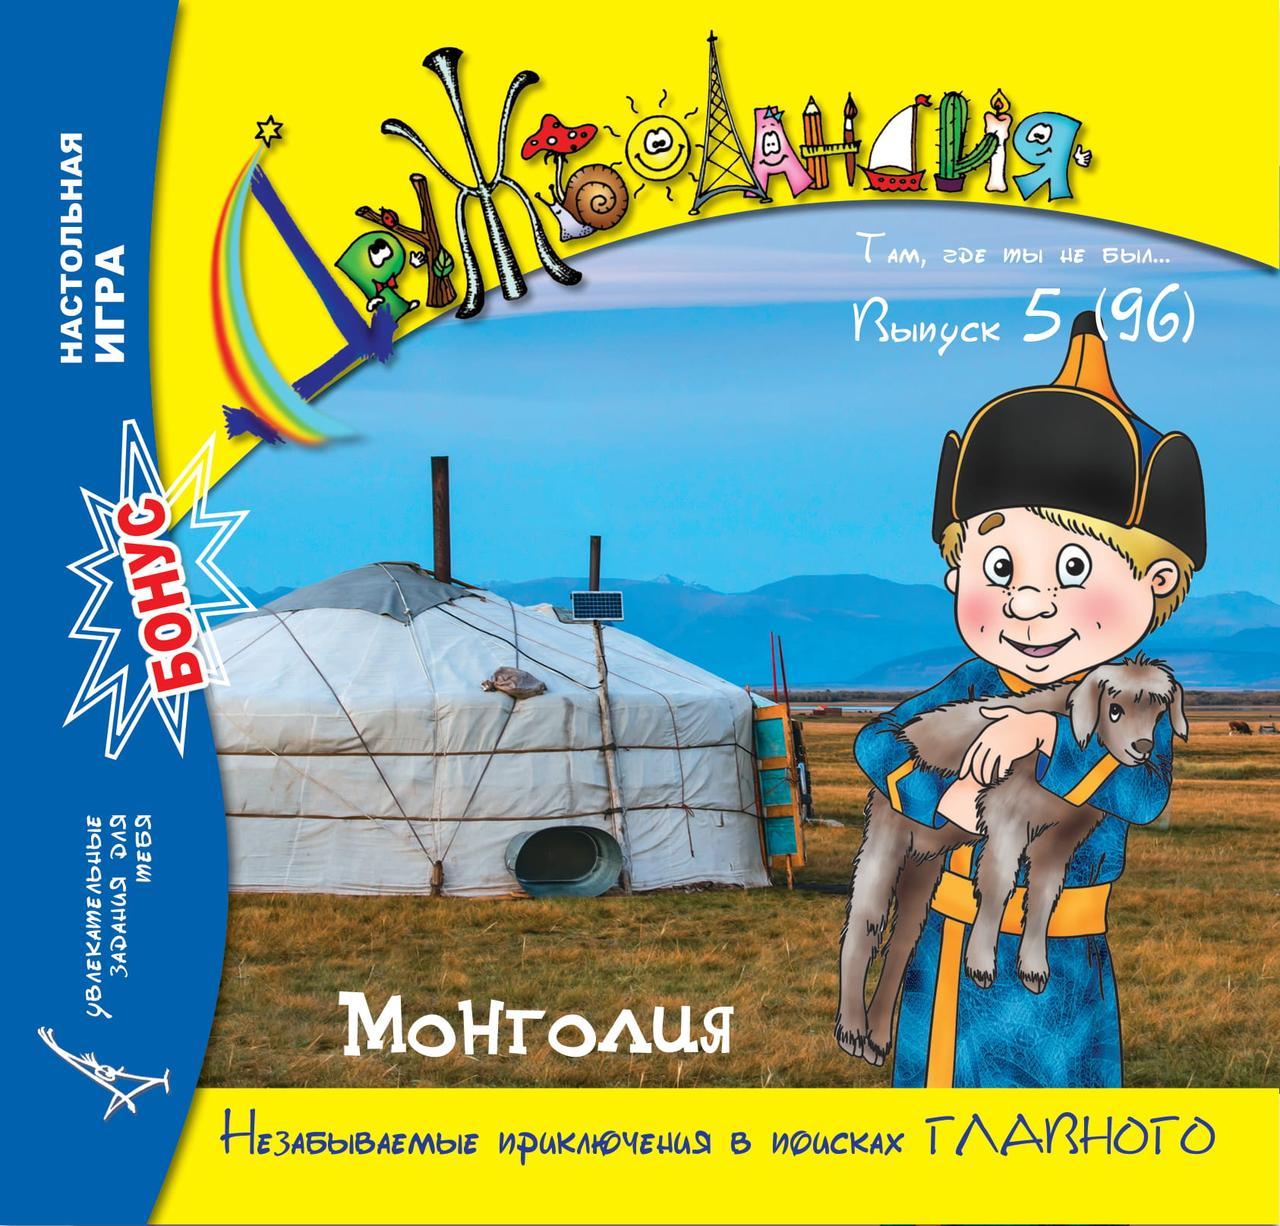 Дружболандия № 05-2020 (рус.) – Монголия